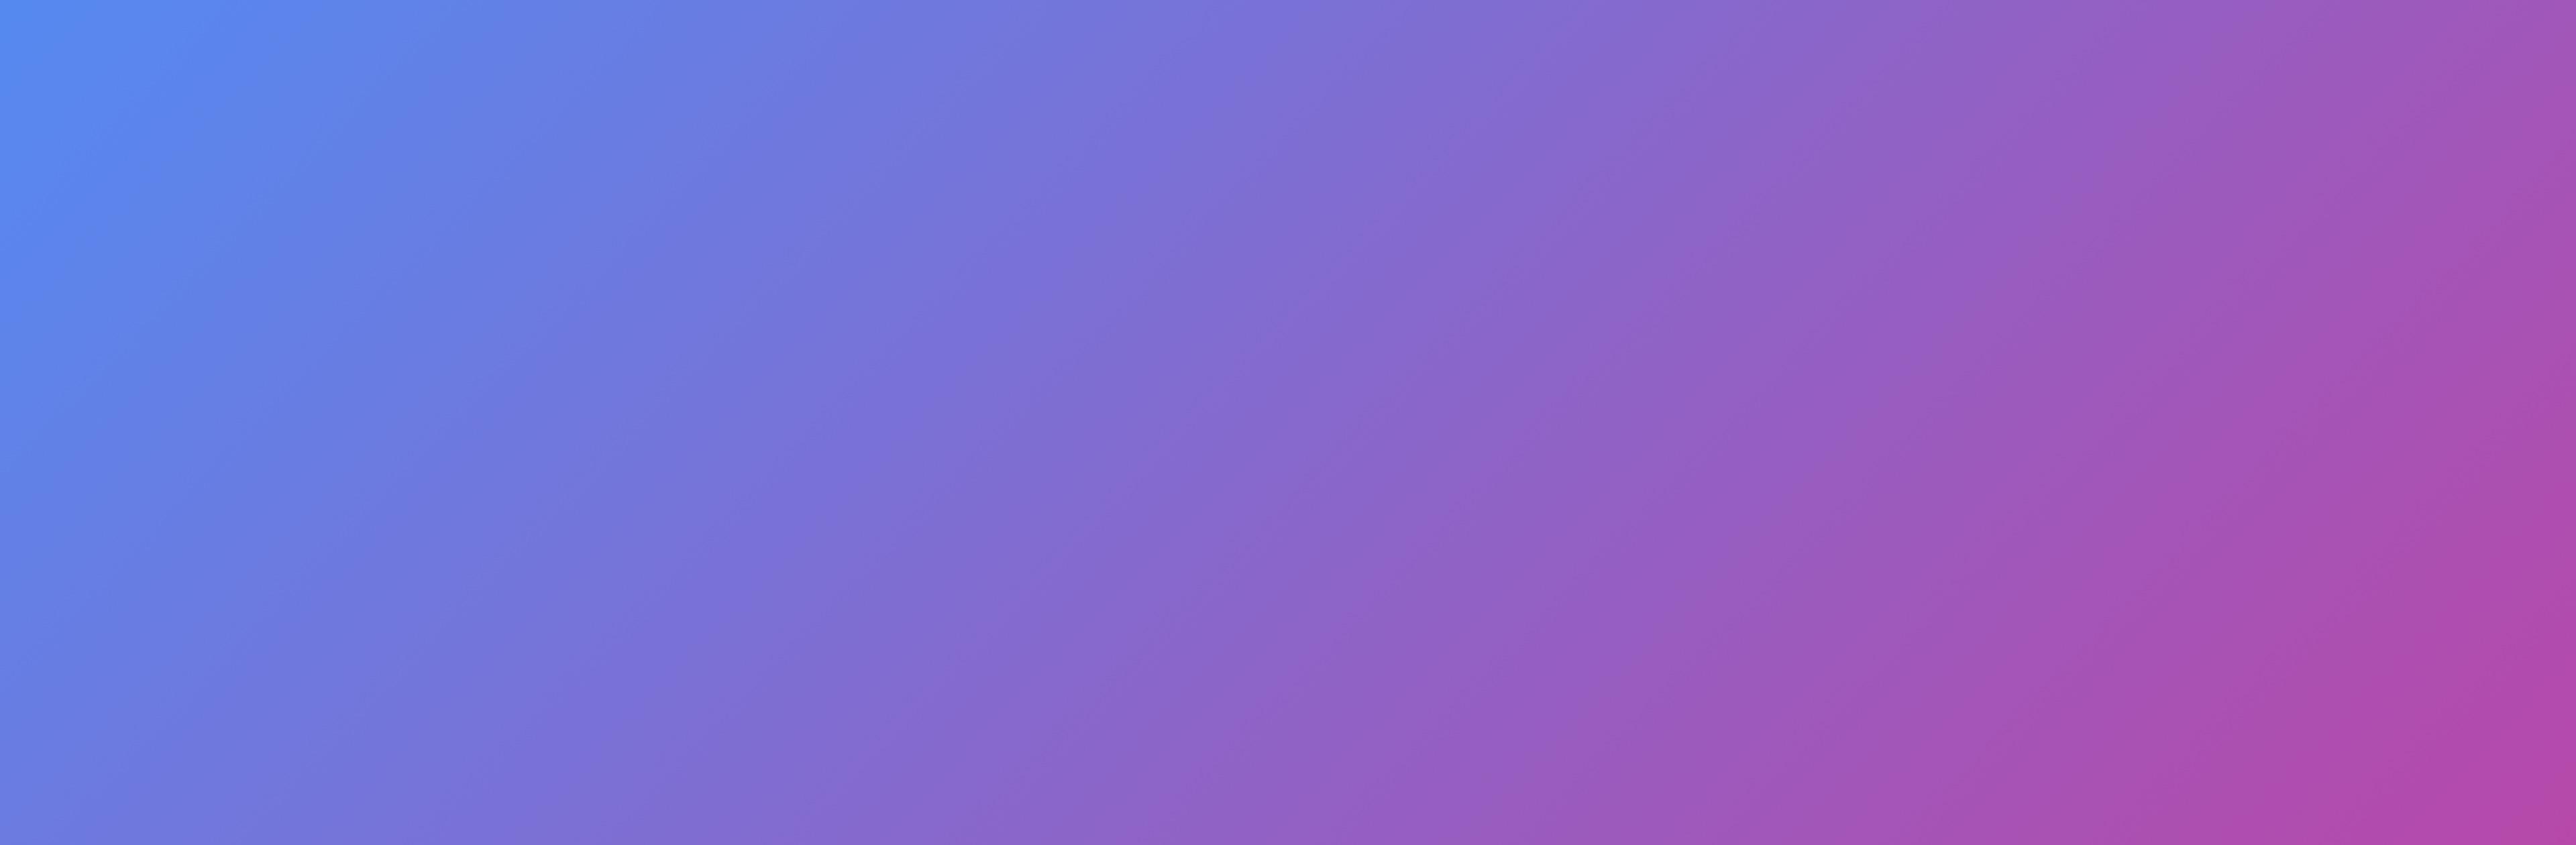 Blue pink gradient